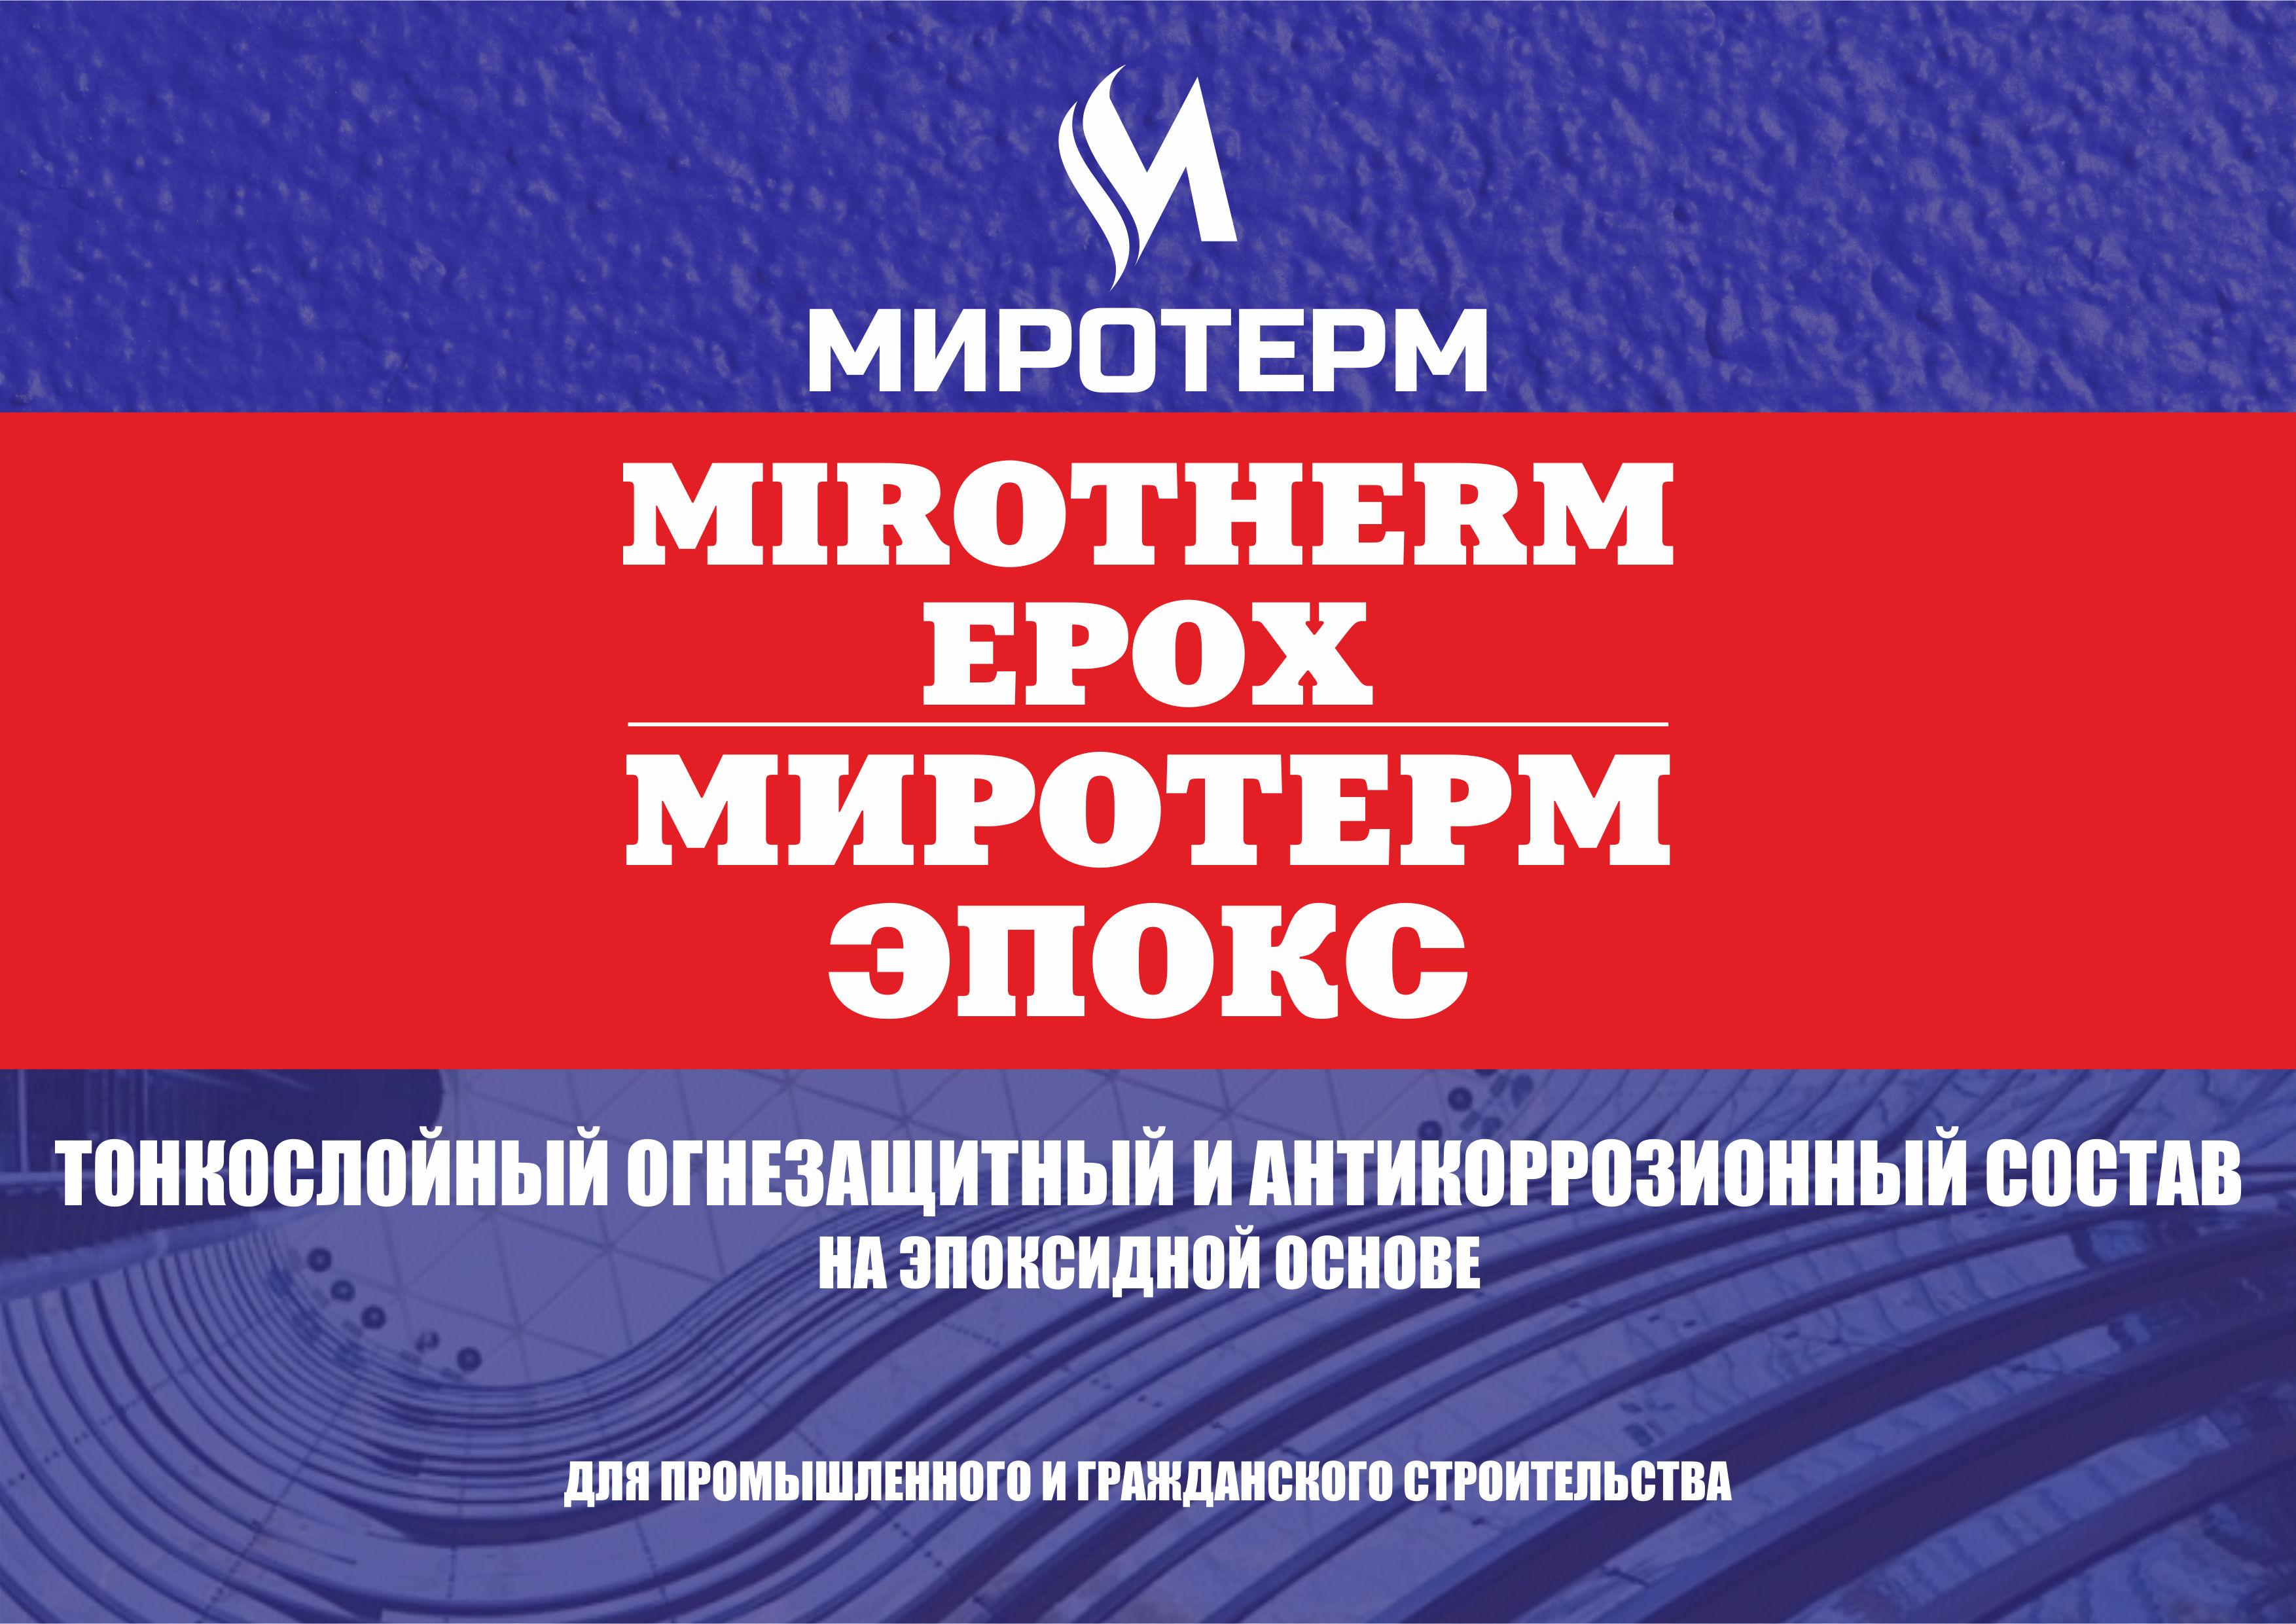 MIROTHERM EPOX_